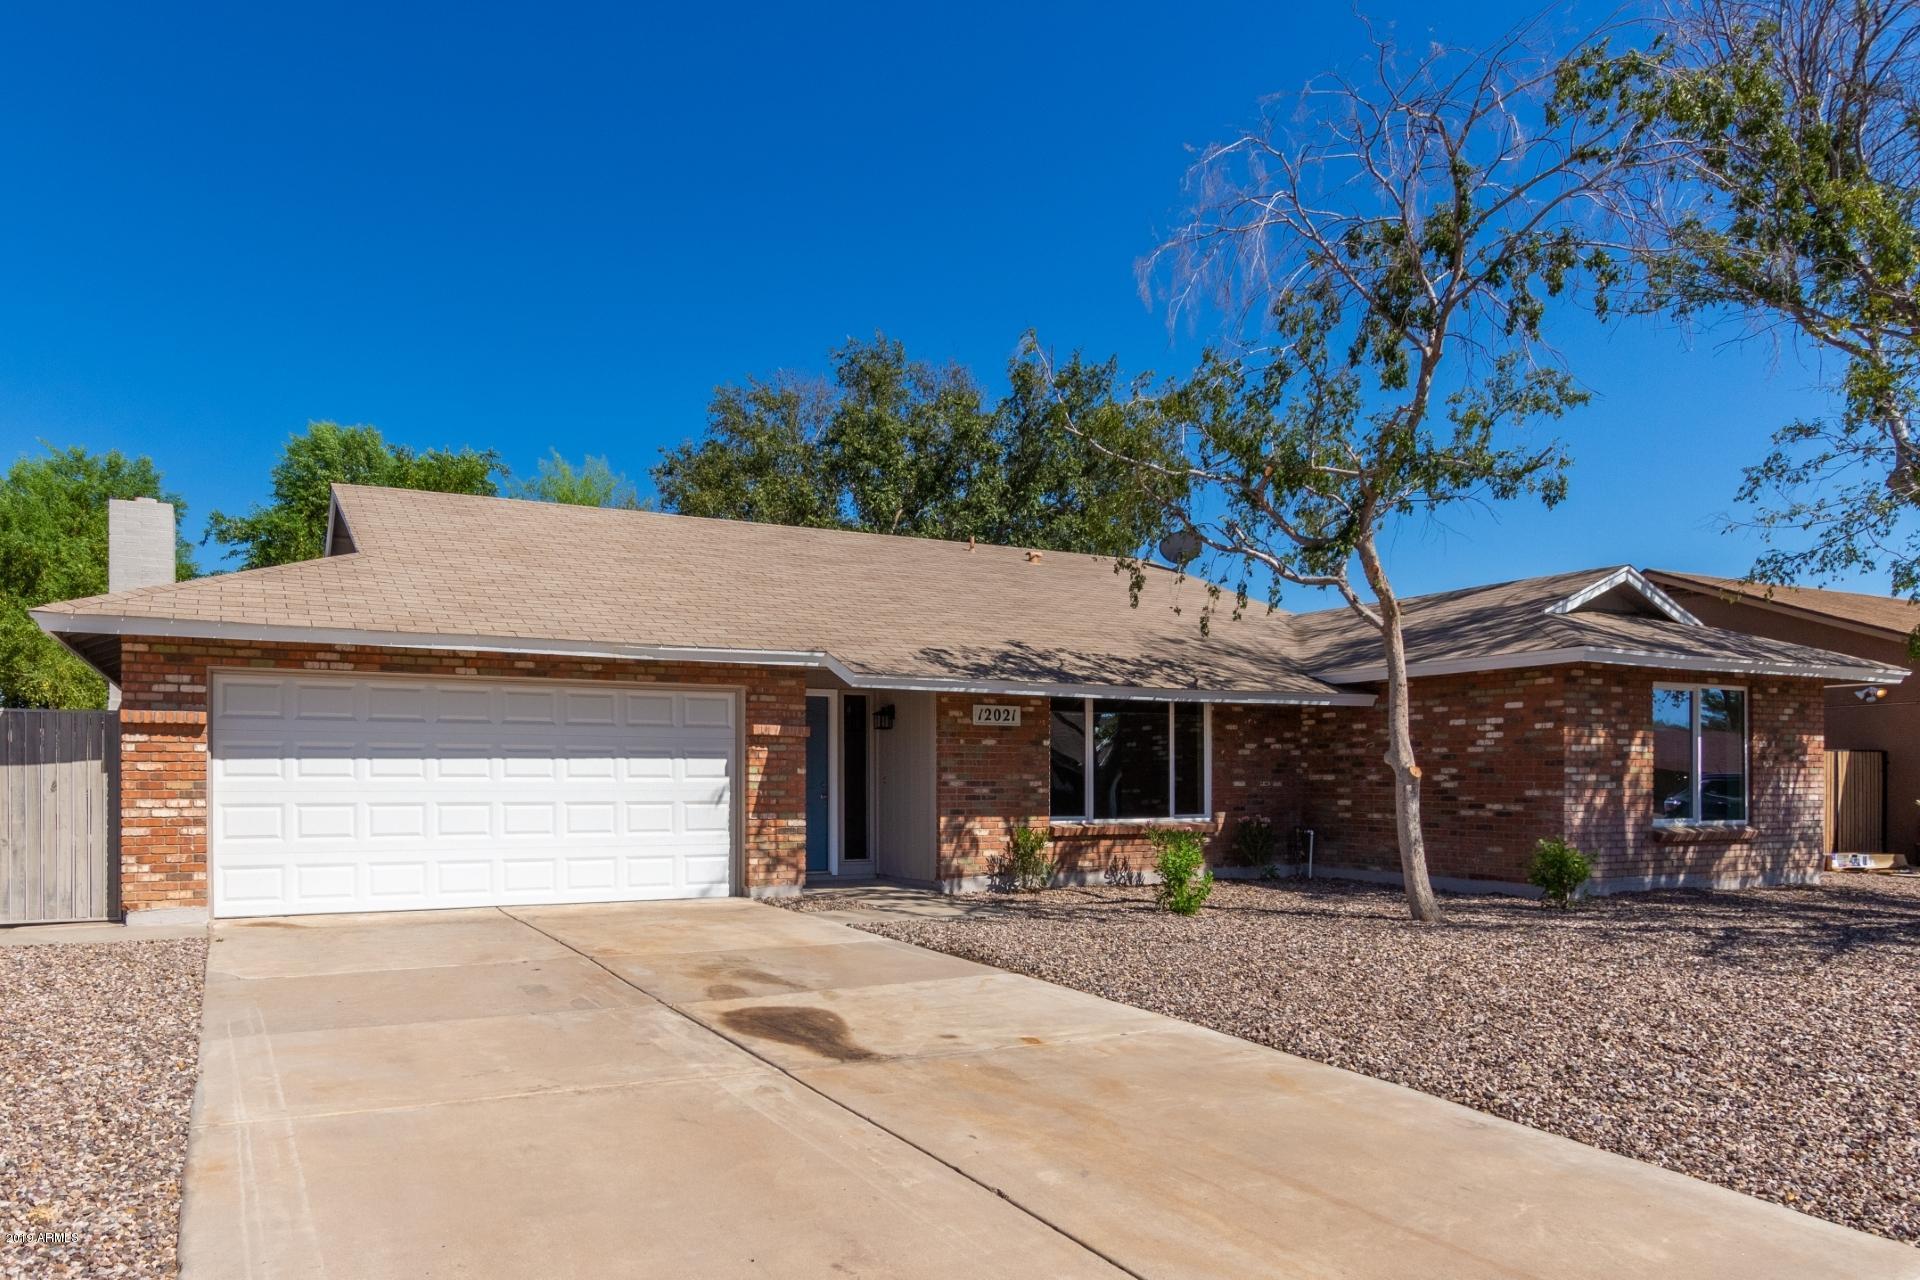 MLS 5971862 12021 N 60TH Avenue, Glendale, AZ 85304 Glendale AZ North Glendale